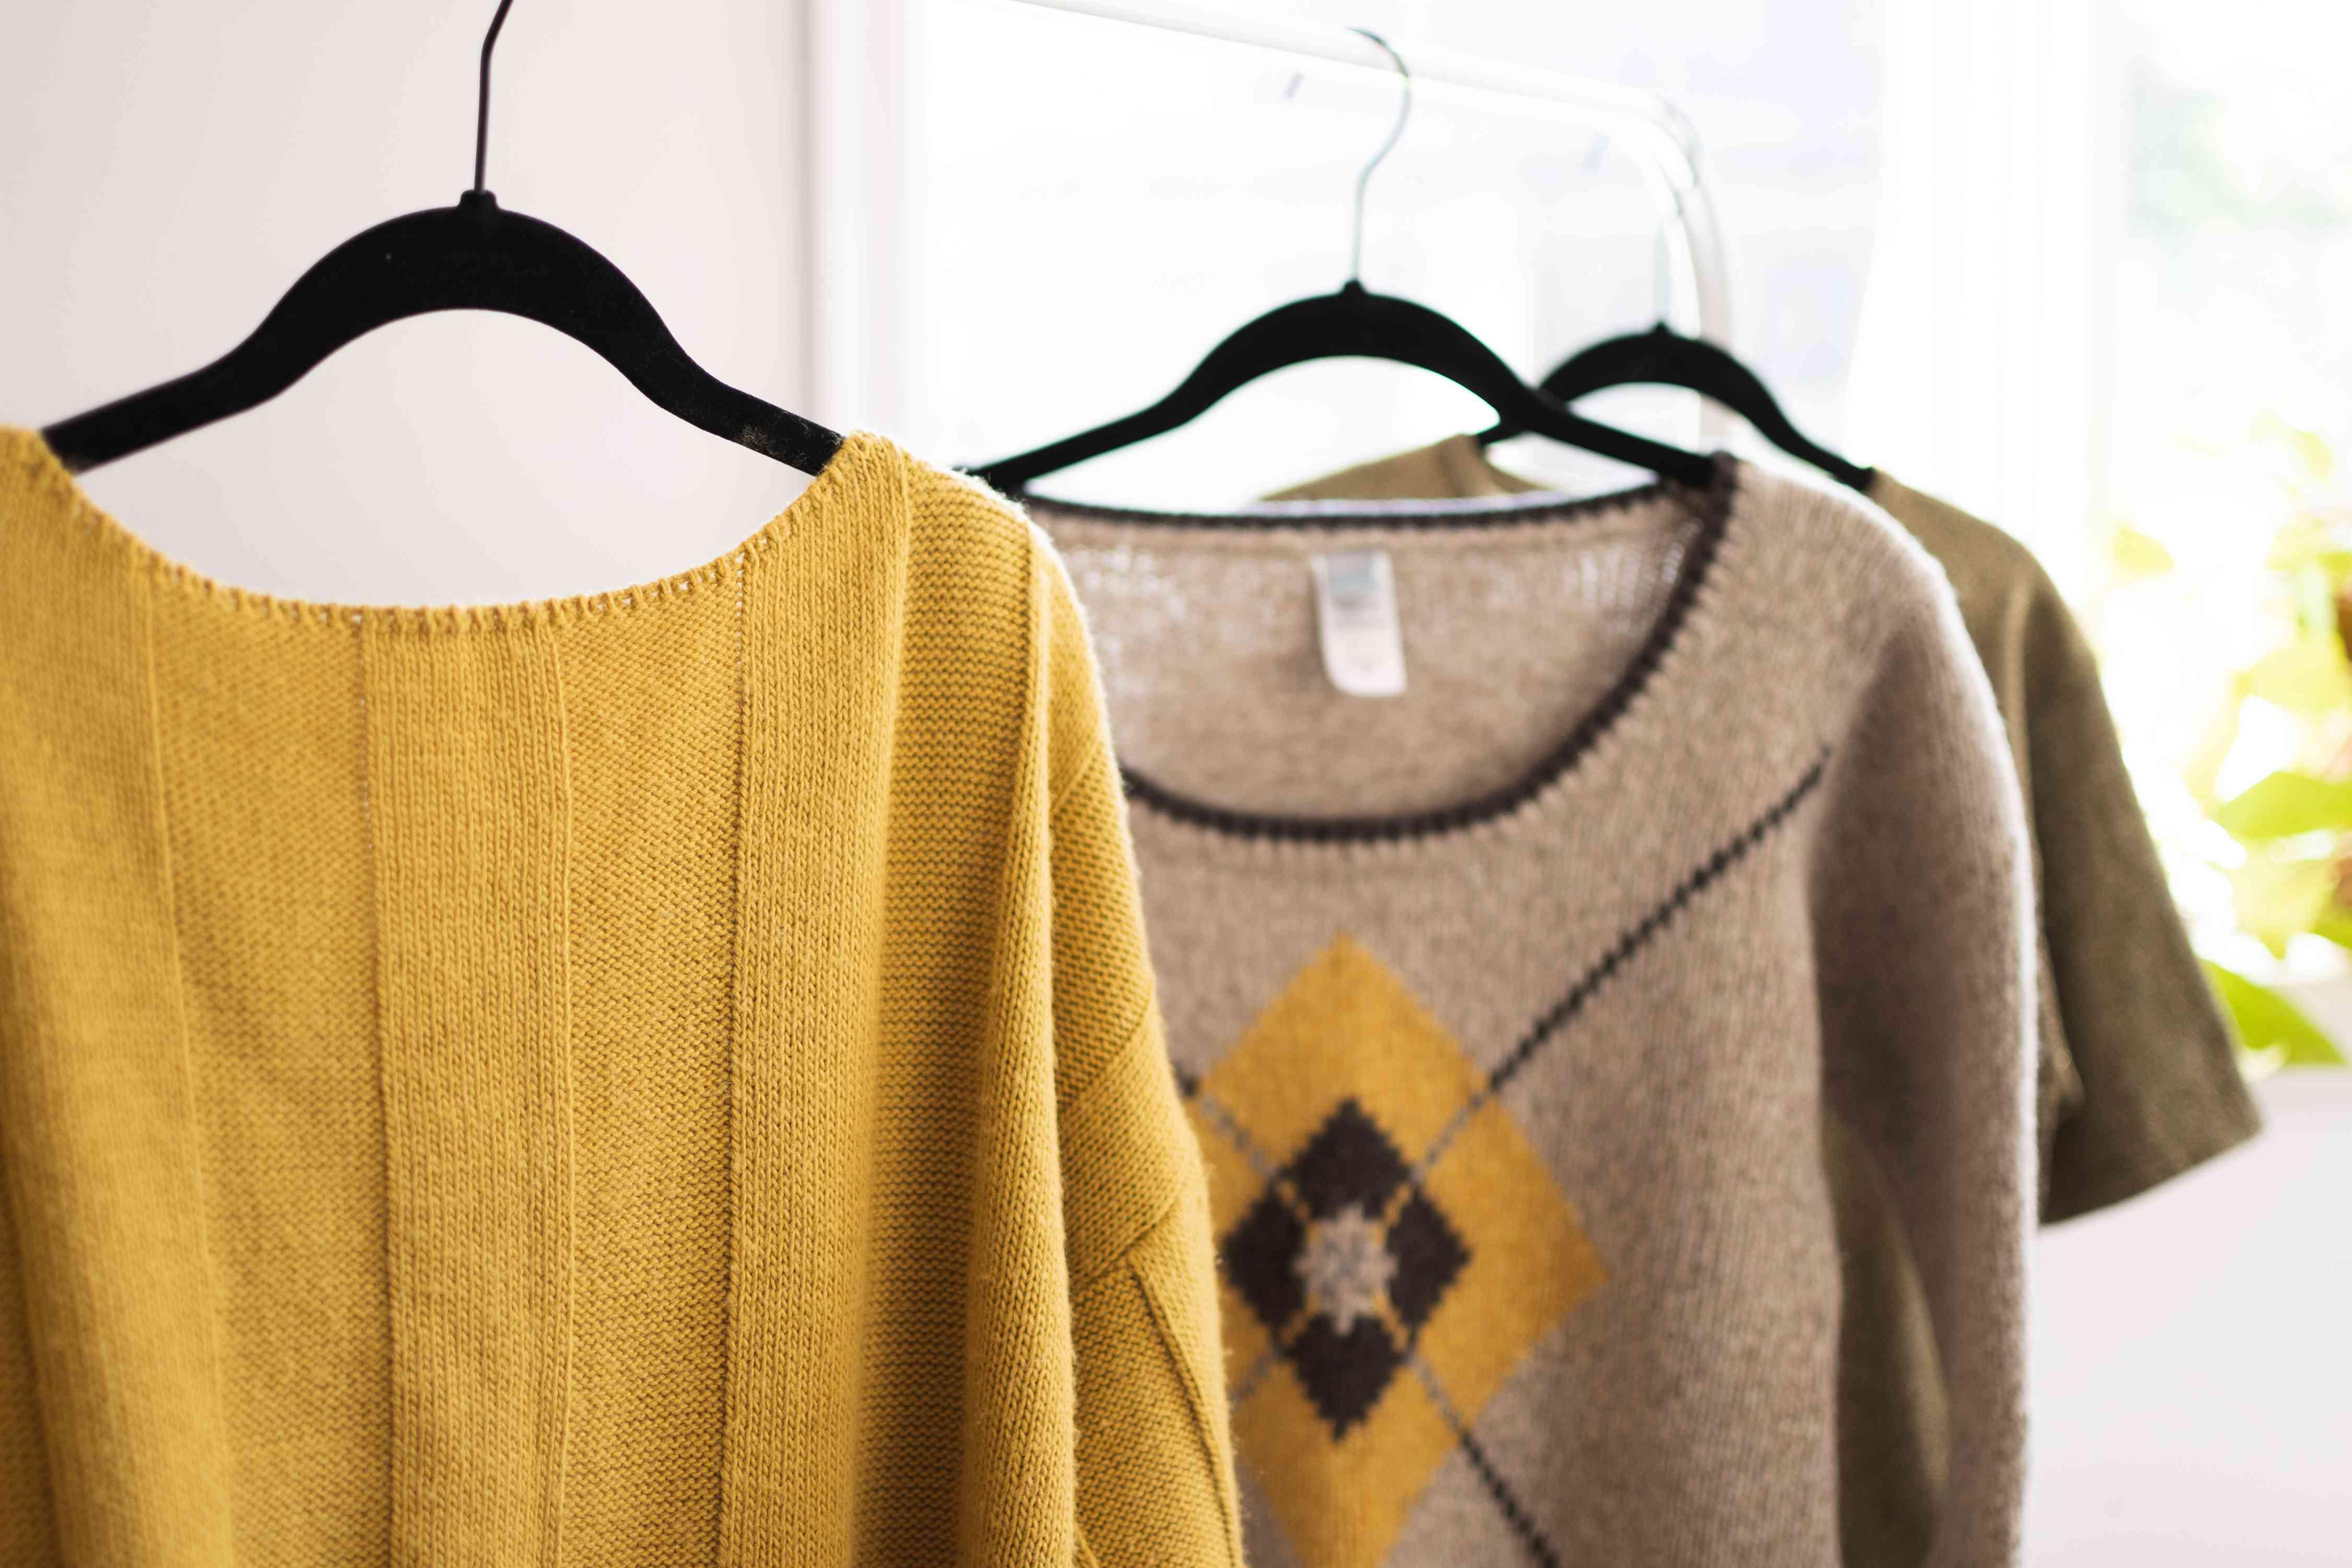 Yellow and beige acrylic sweaters hanging on black hangers